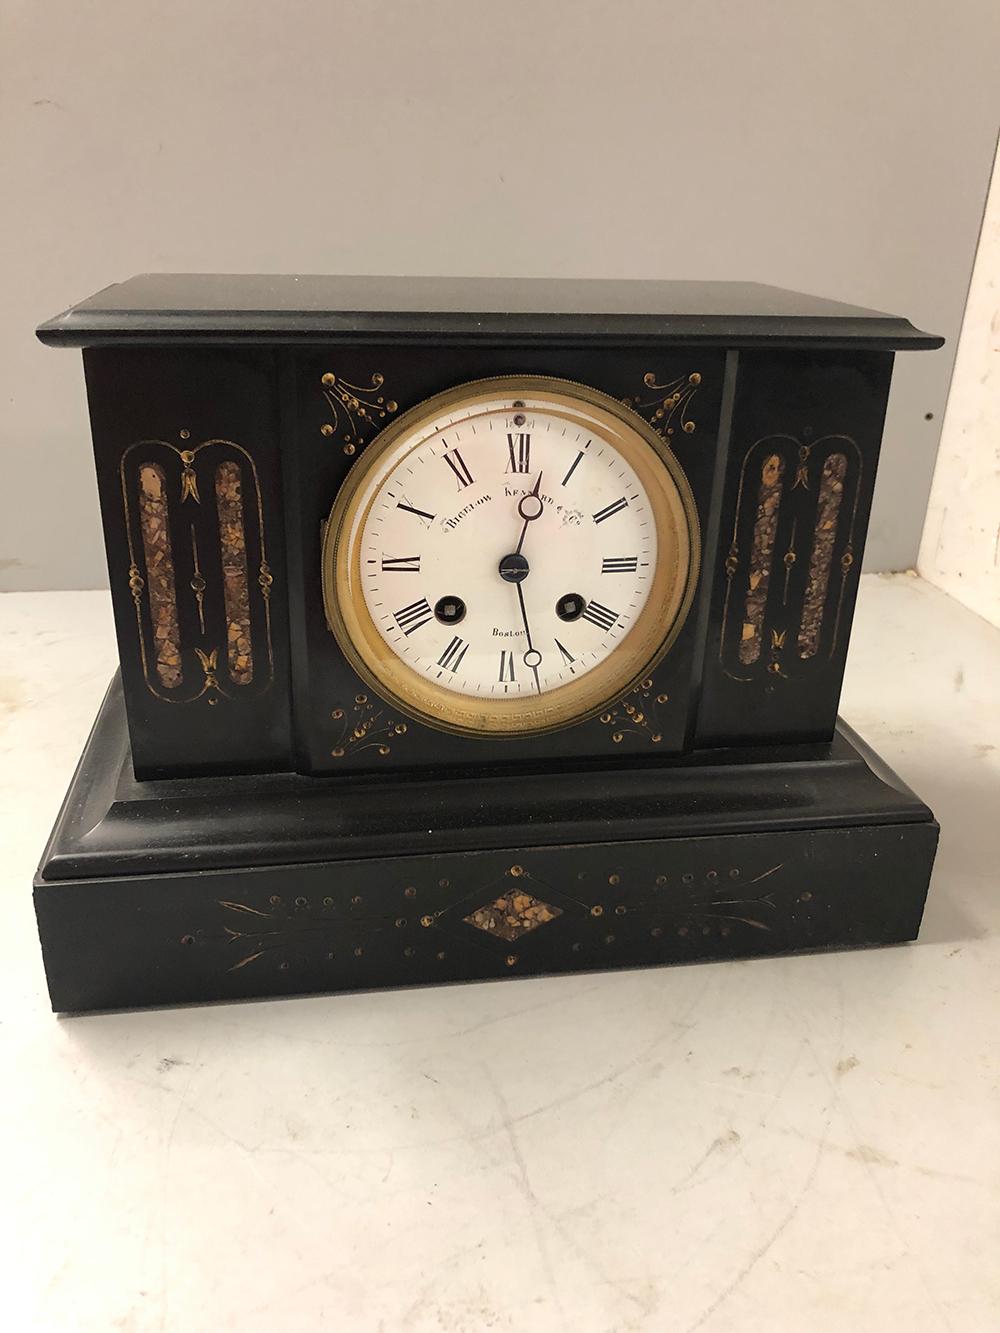 Bigelow Kennard & Co. Mantel Clock